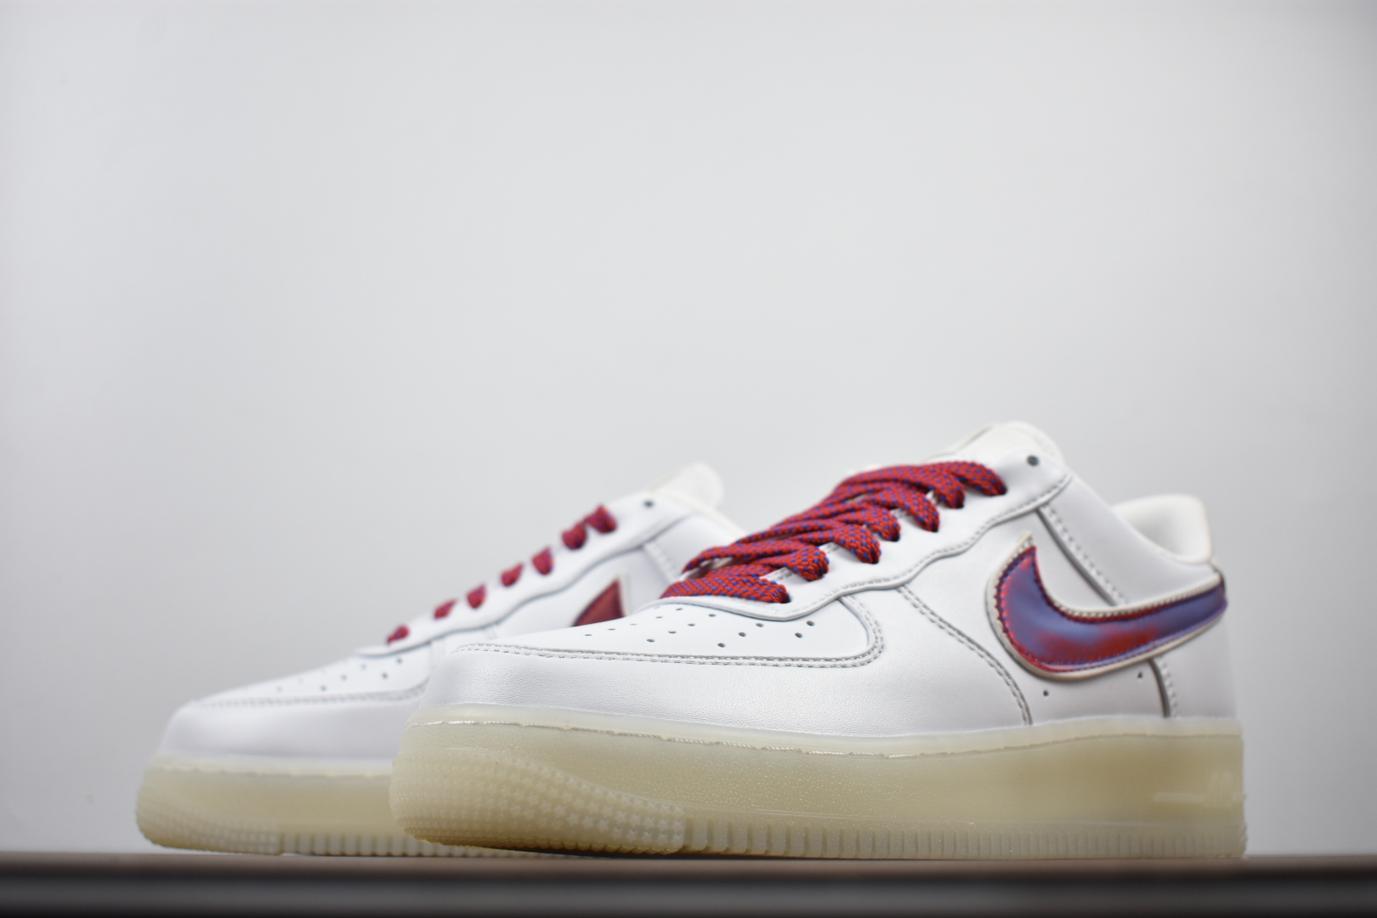 Nike Air Force 1 Low De Lo Mio 6